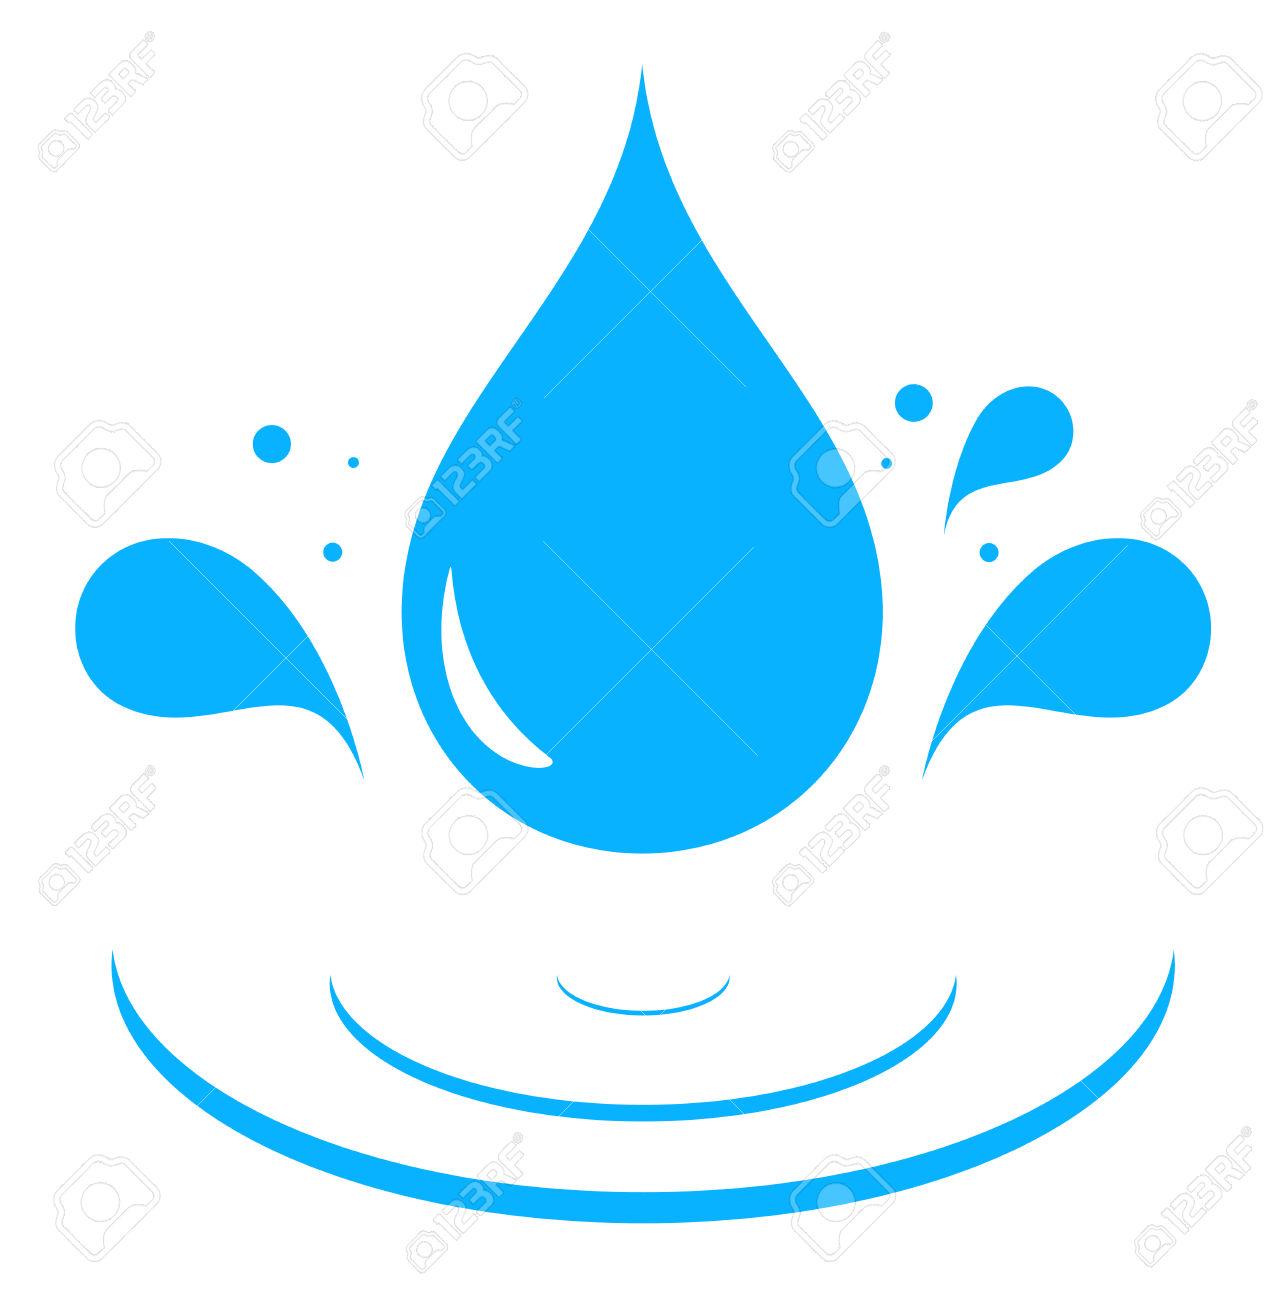 Icono Con Agua Azul Chapoteo De La Gota De La Silueta.